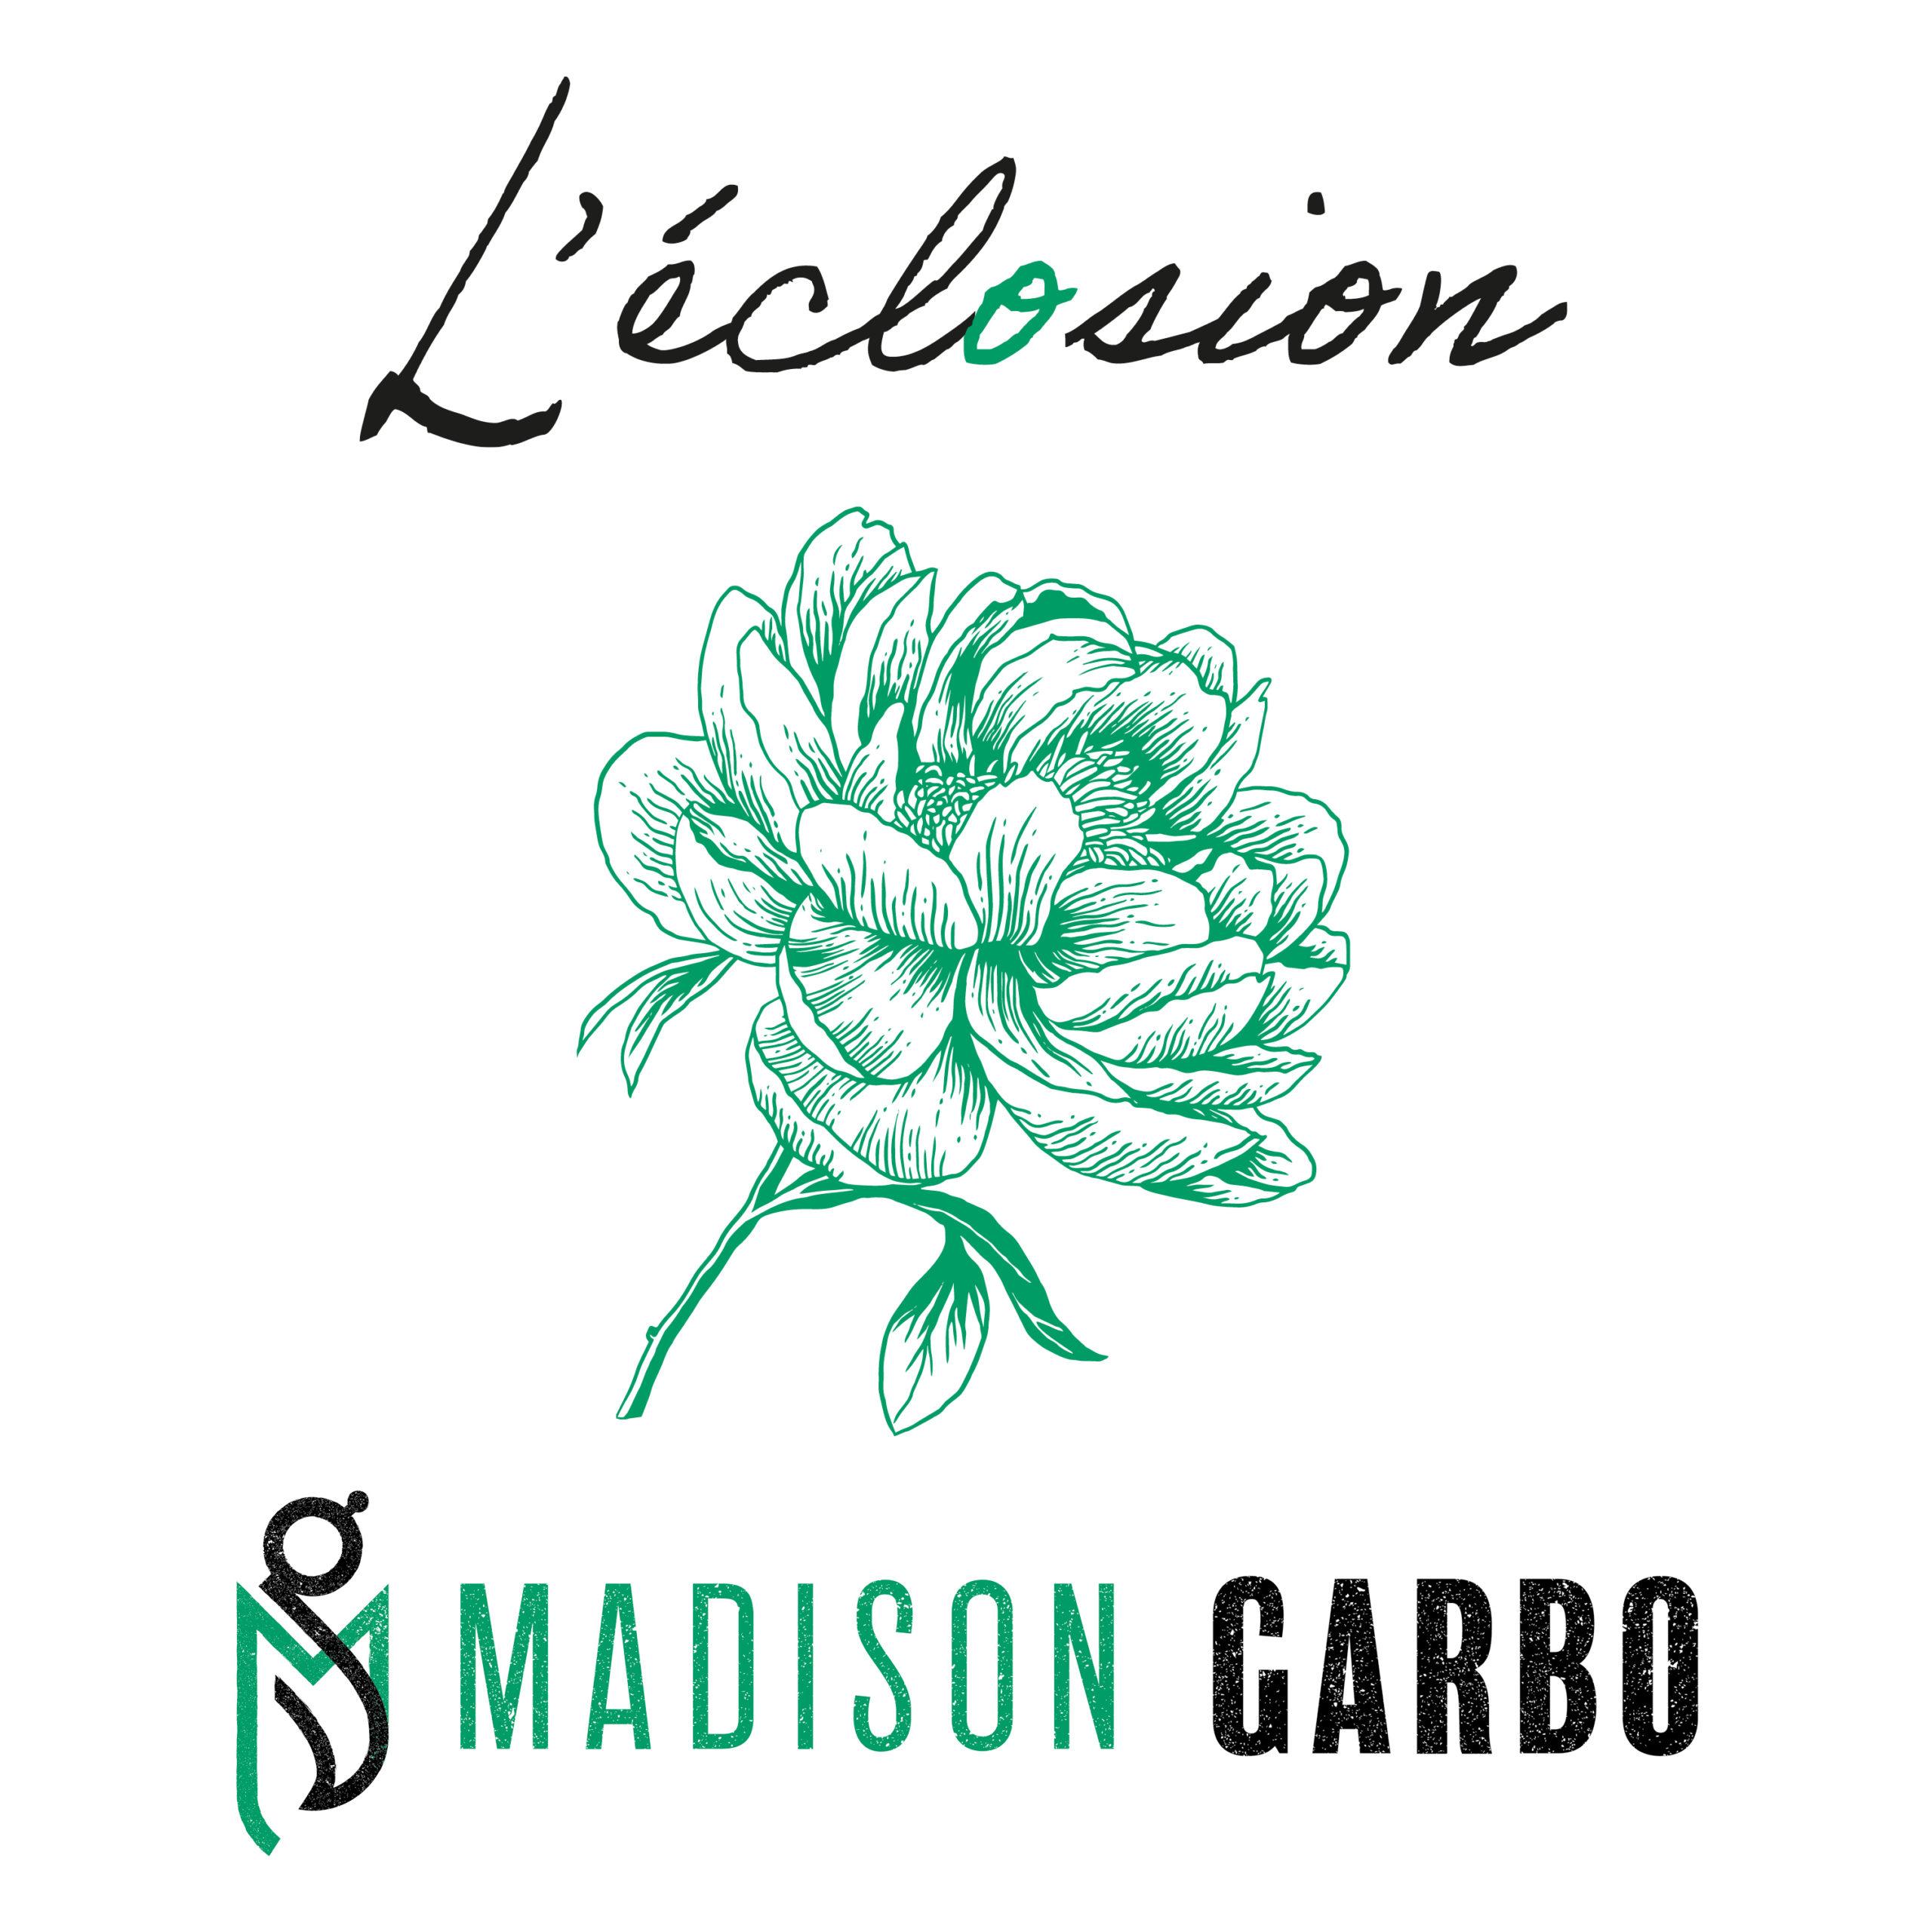 Eclosion Madison Garbo